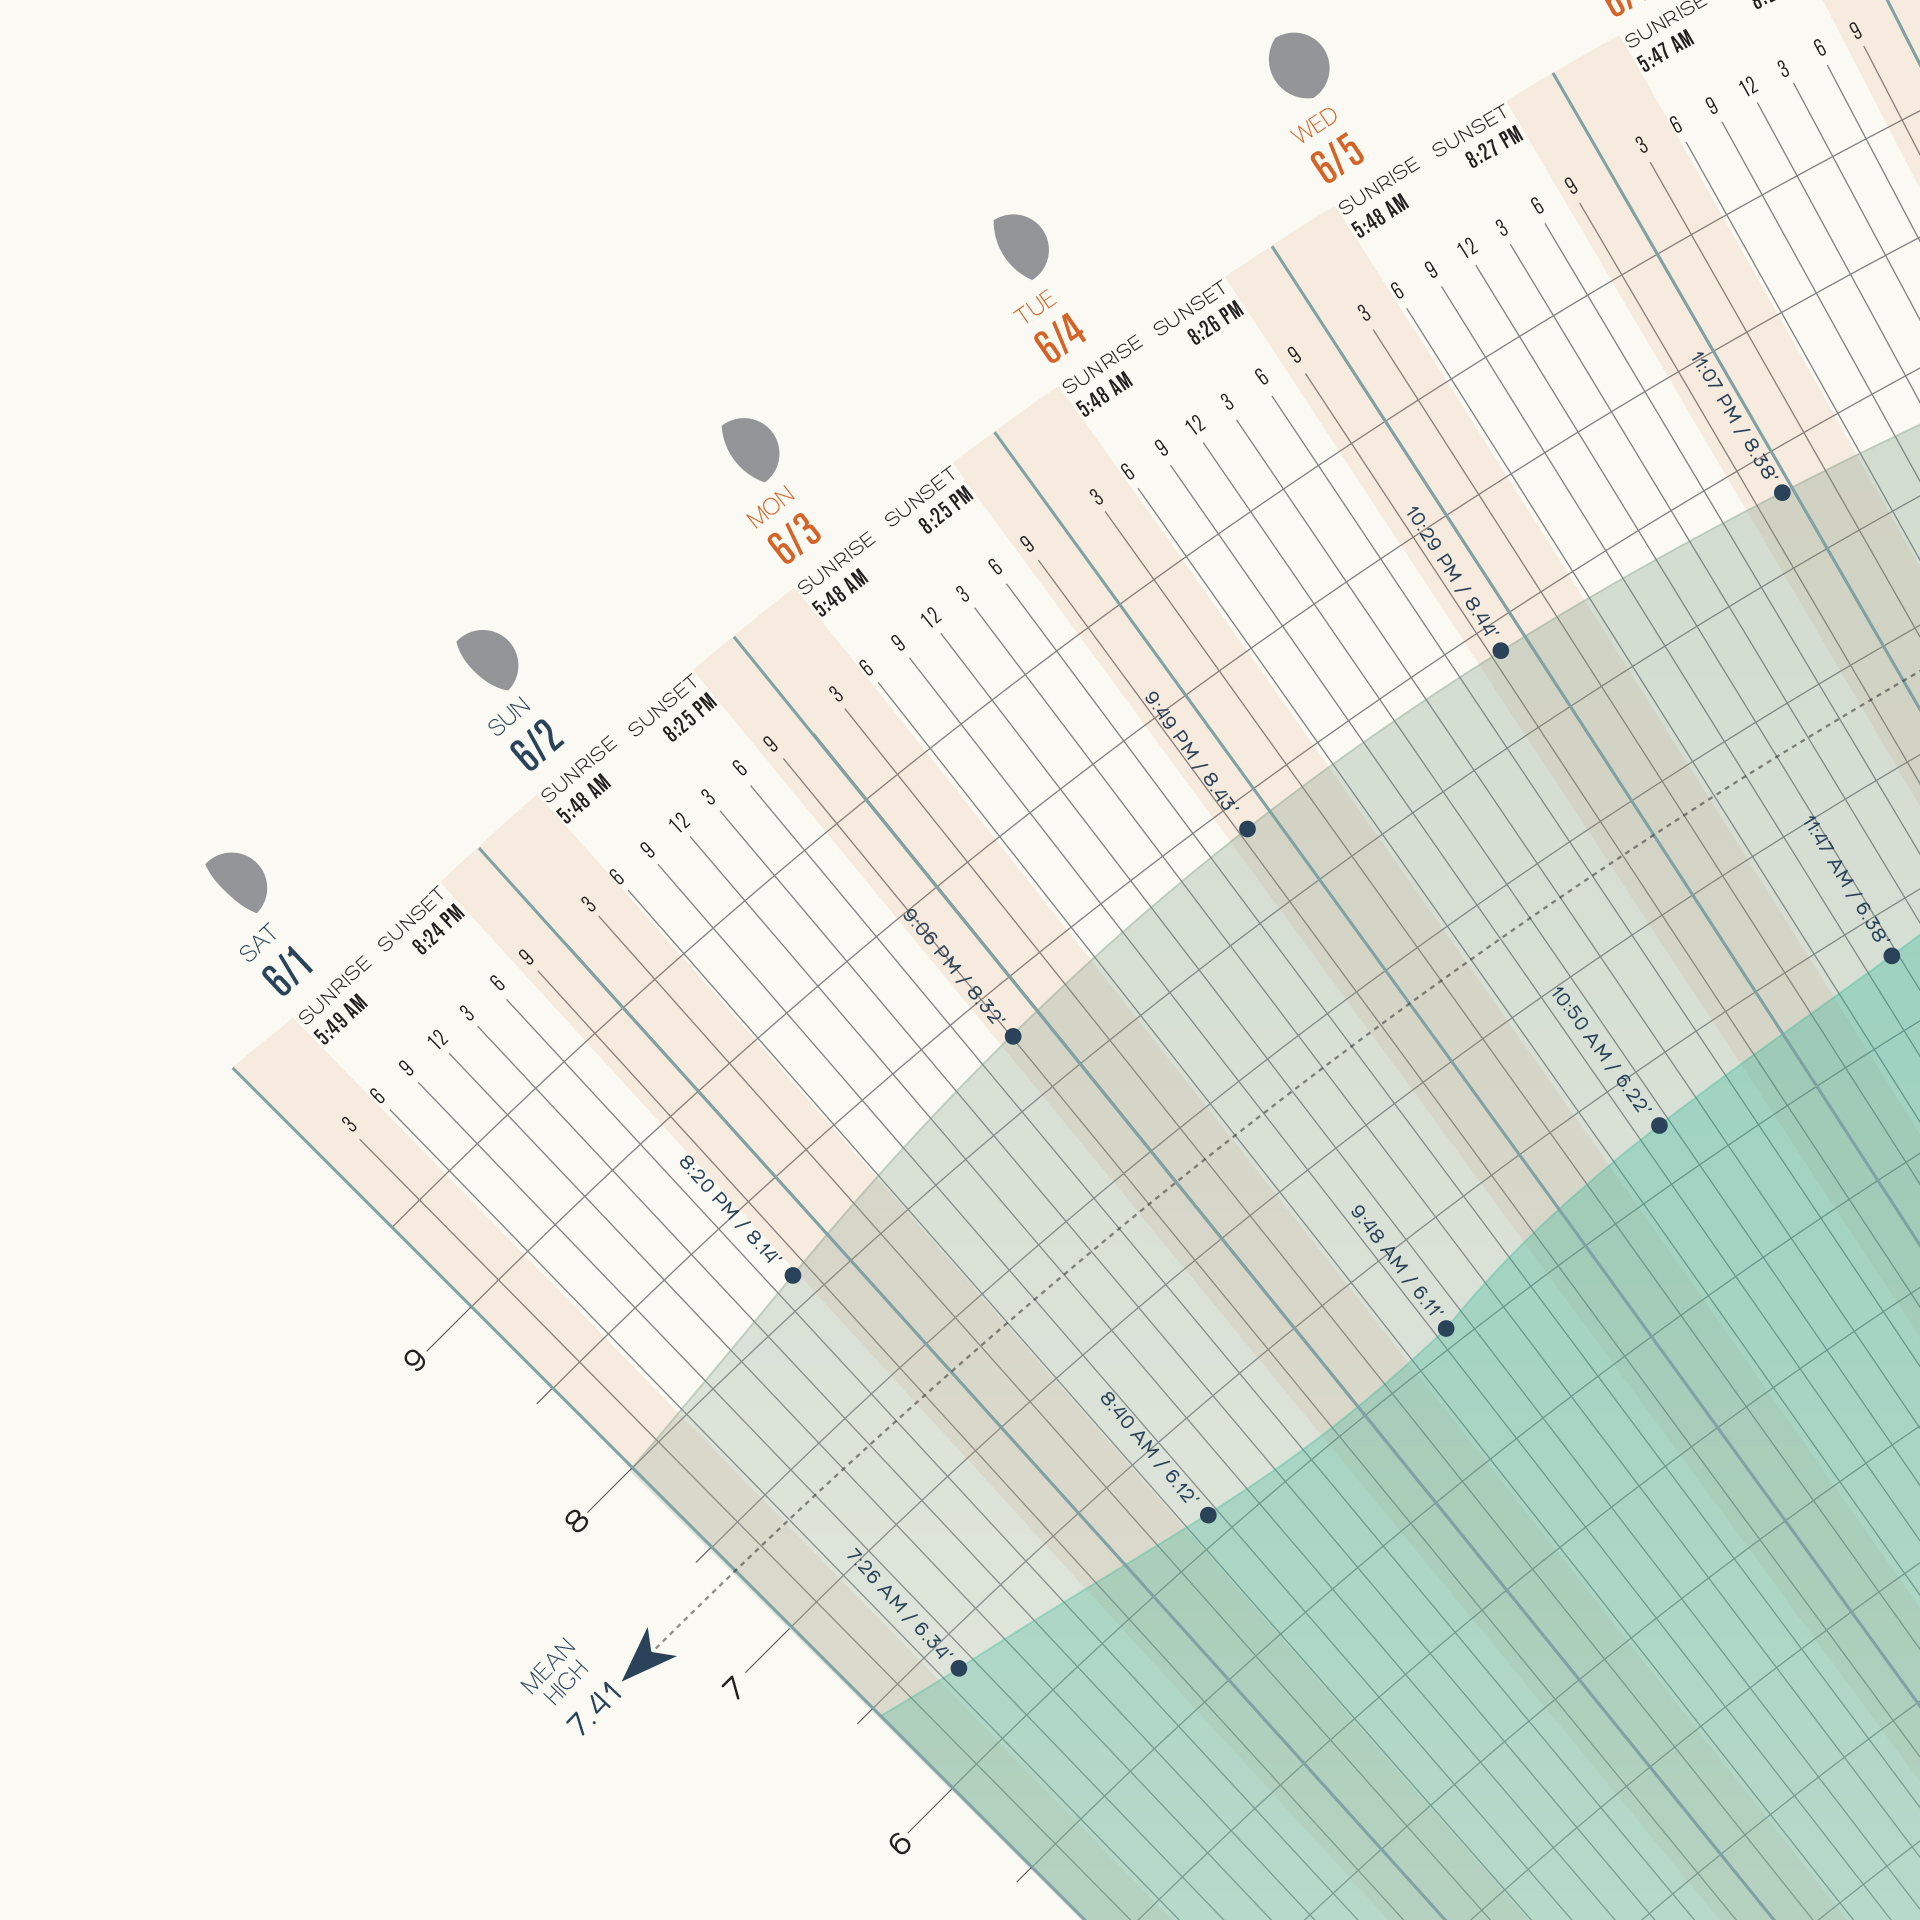 Tide_Prediction_Chart_Thumbnail-01.jpg